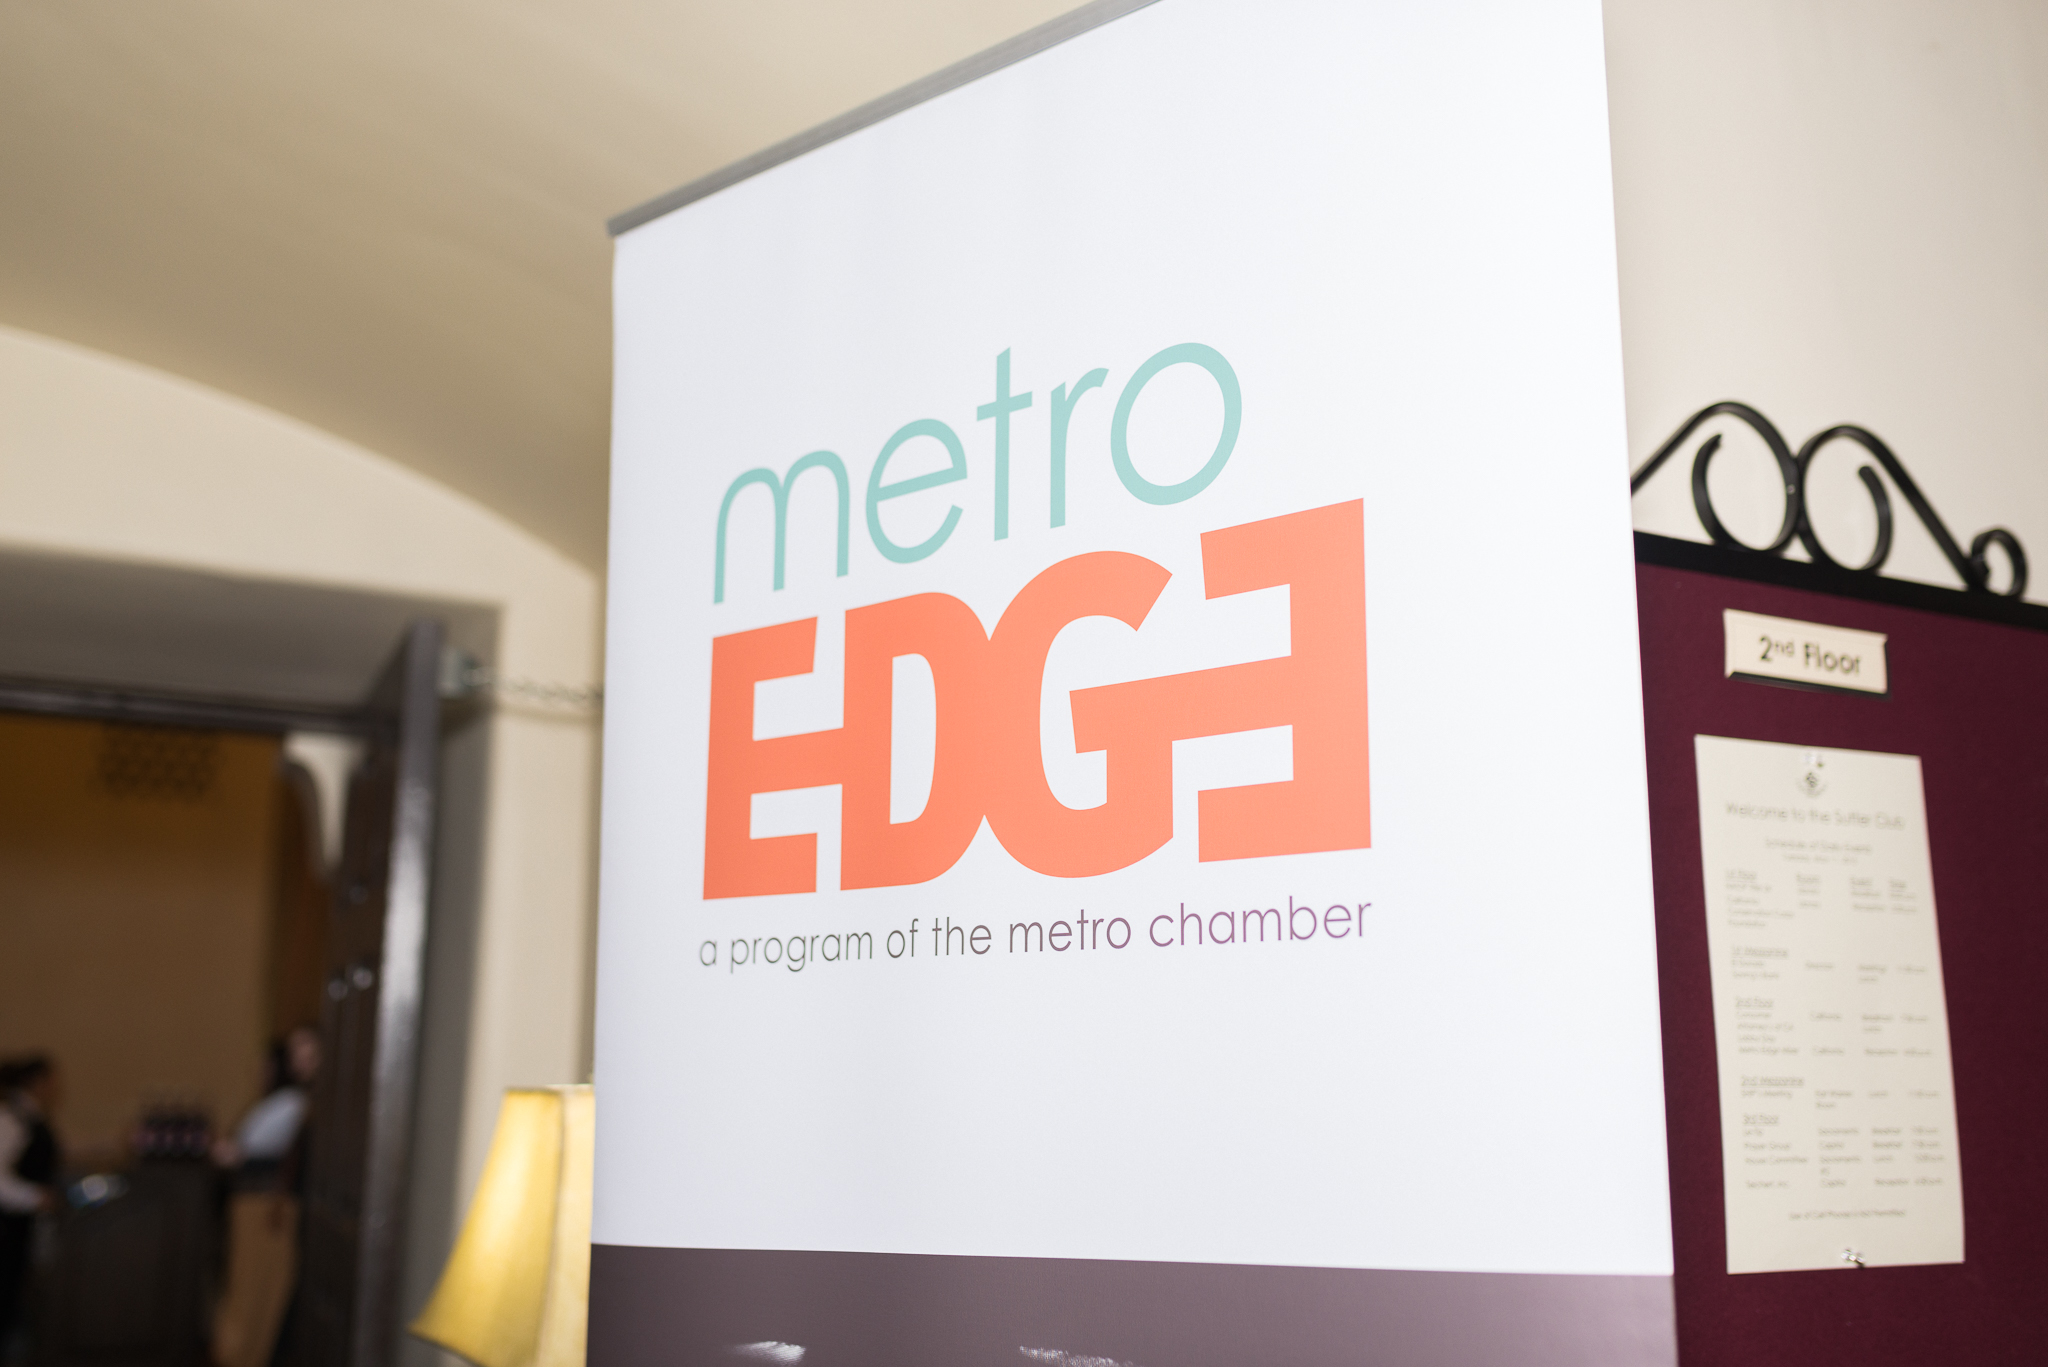 MetroEdge (1)